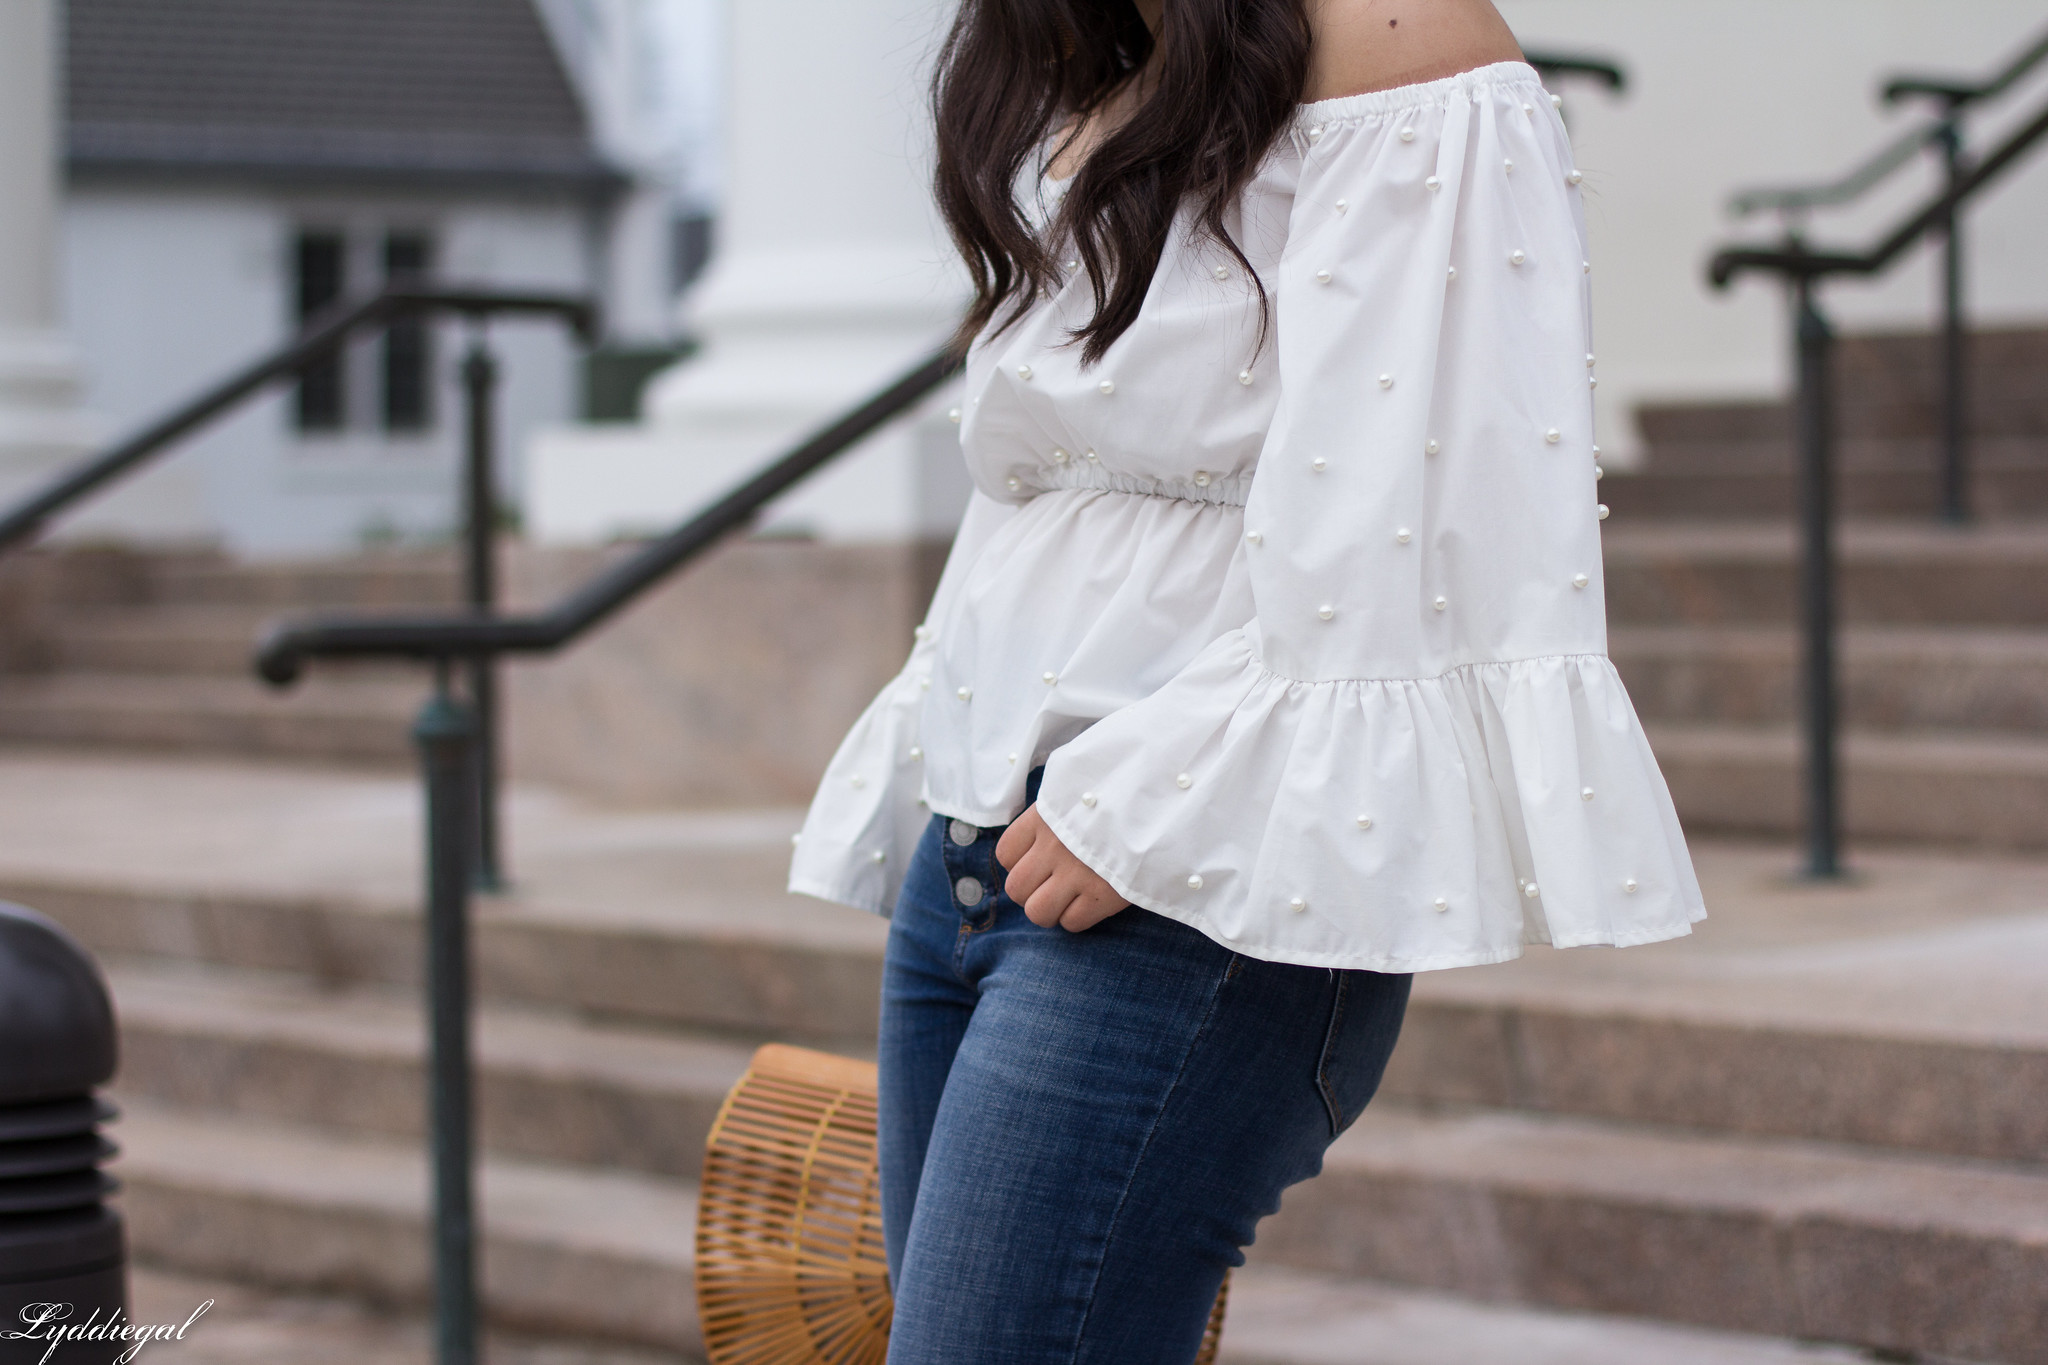 off the shoulder pearl embellished blouse, distressed denim, bamboo purse-10.jpg